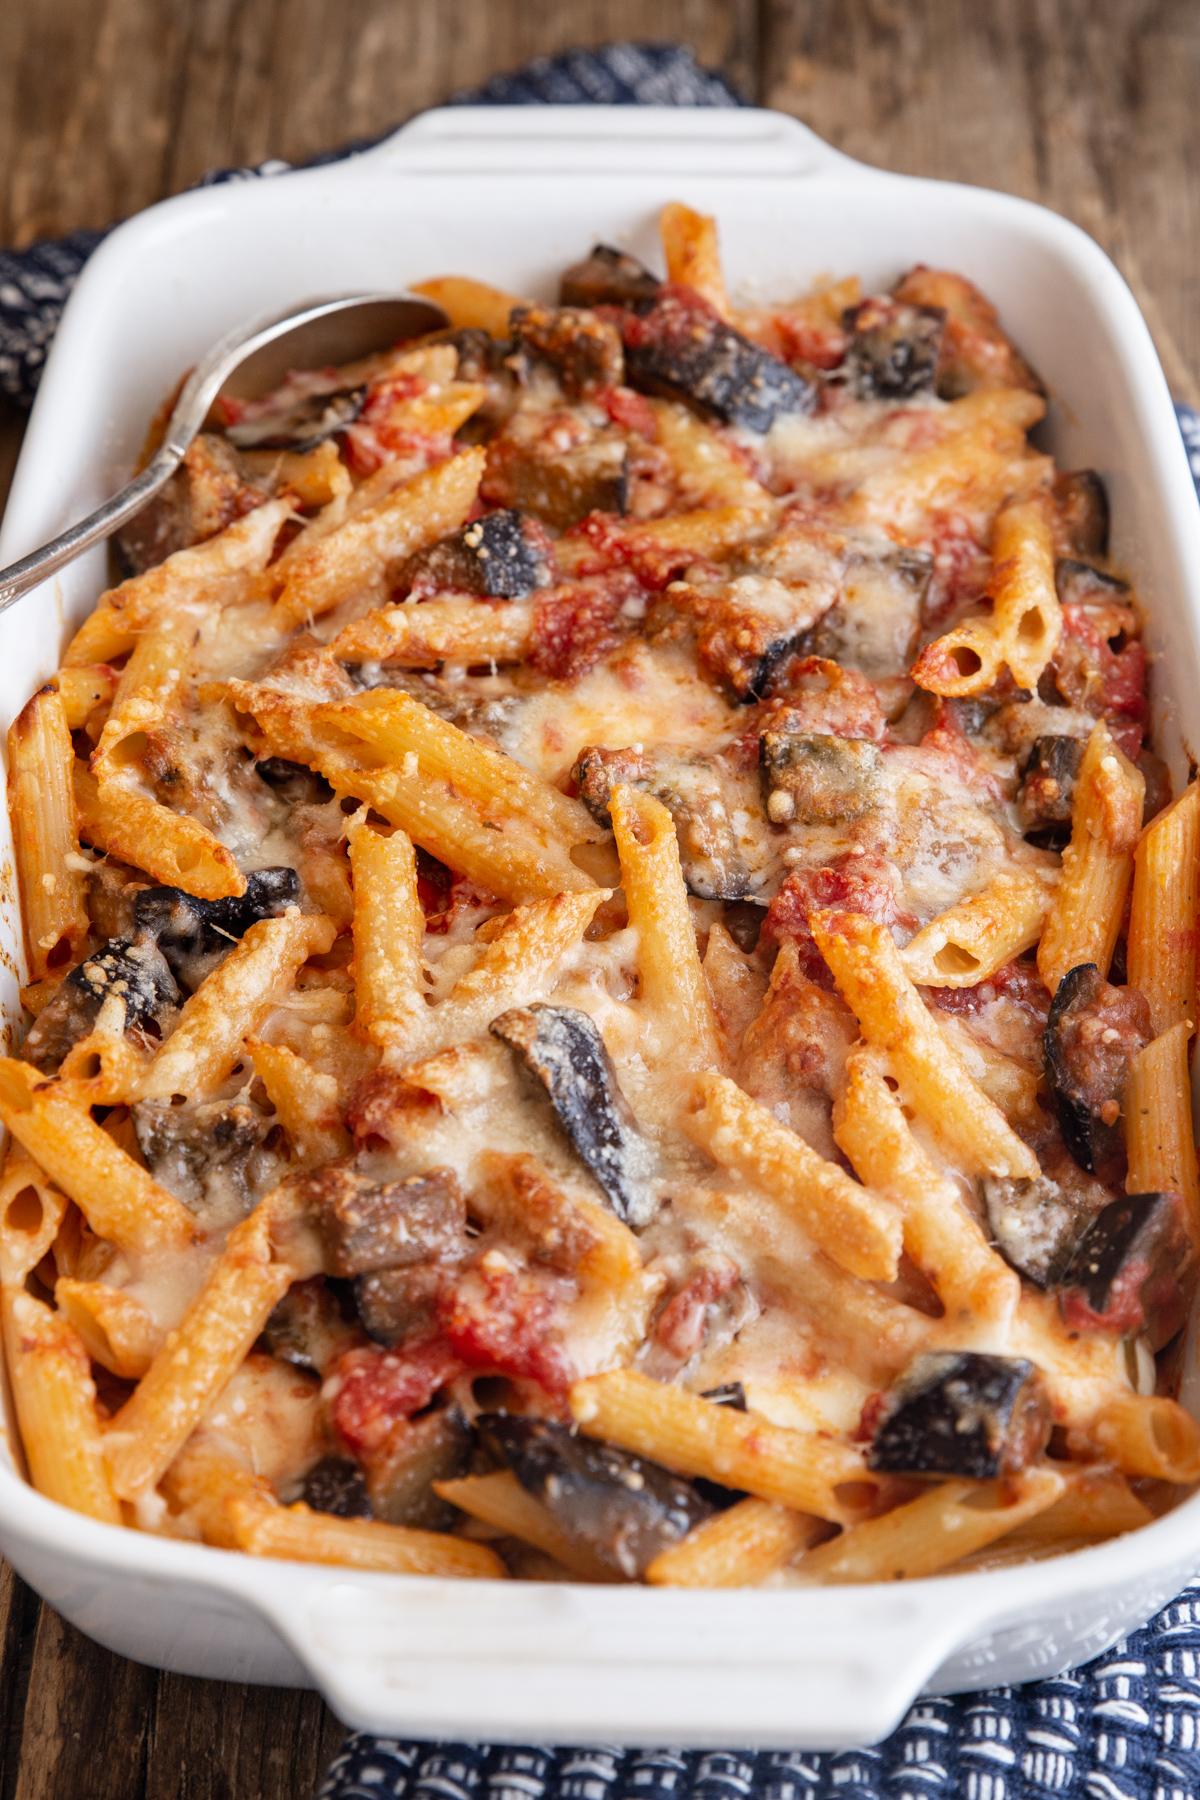 Sicilian pasta in a white baking dish.